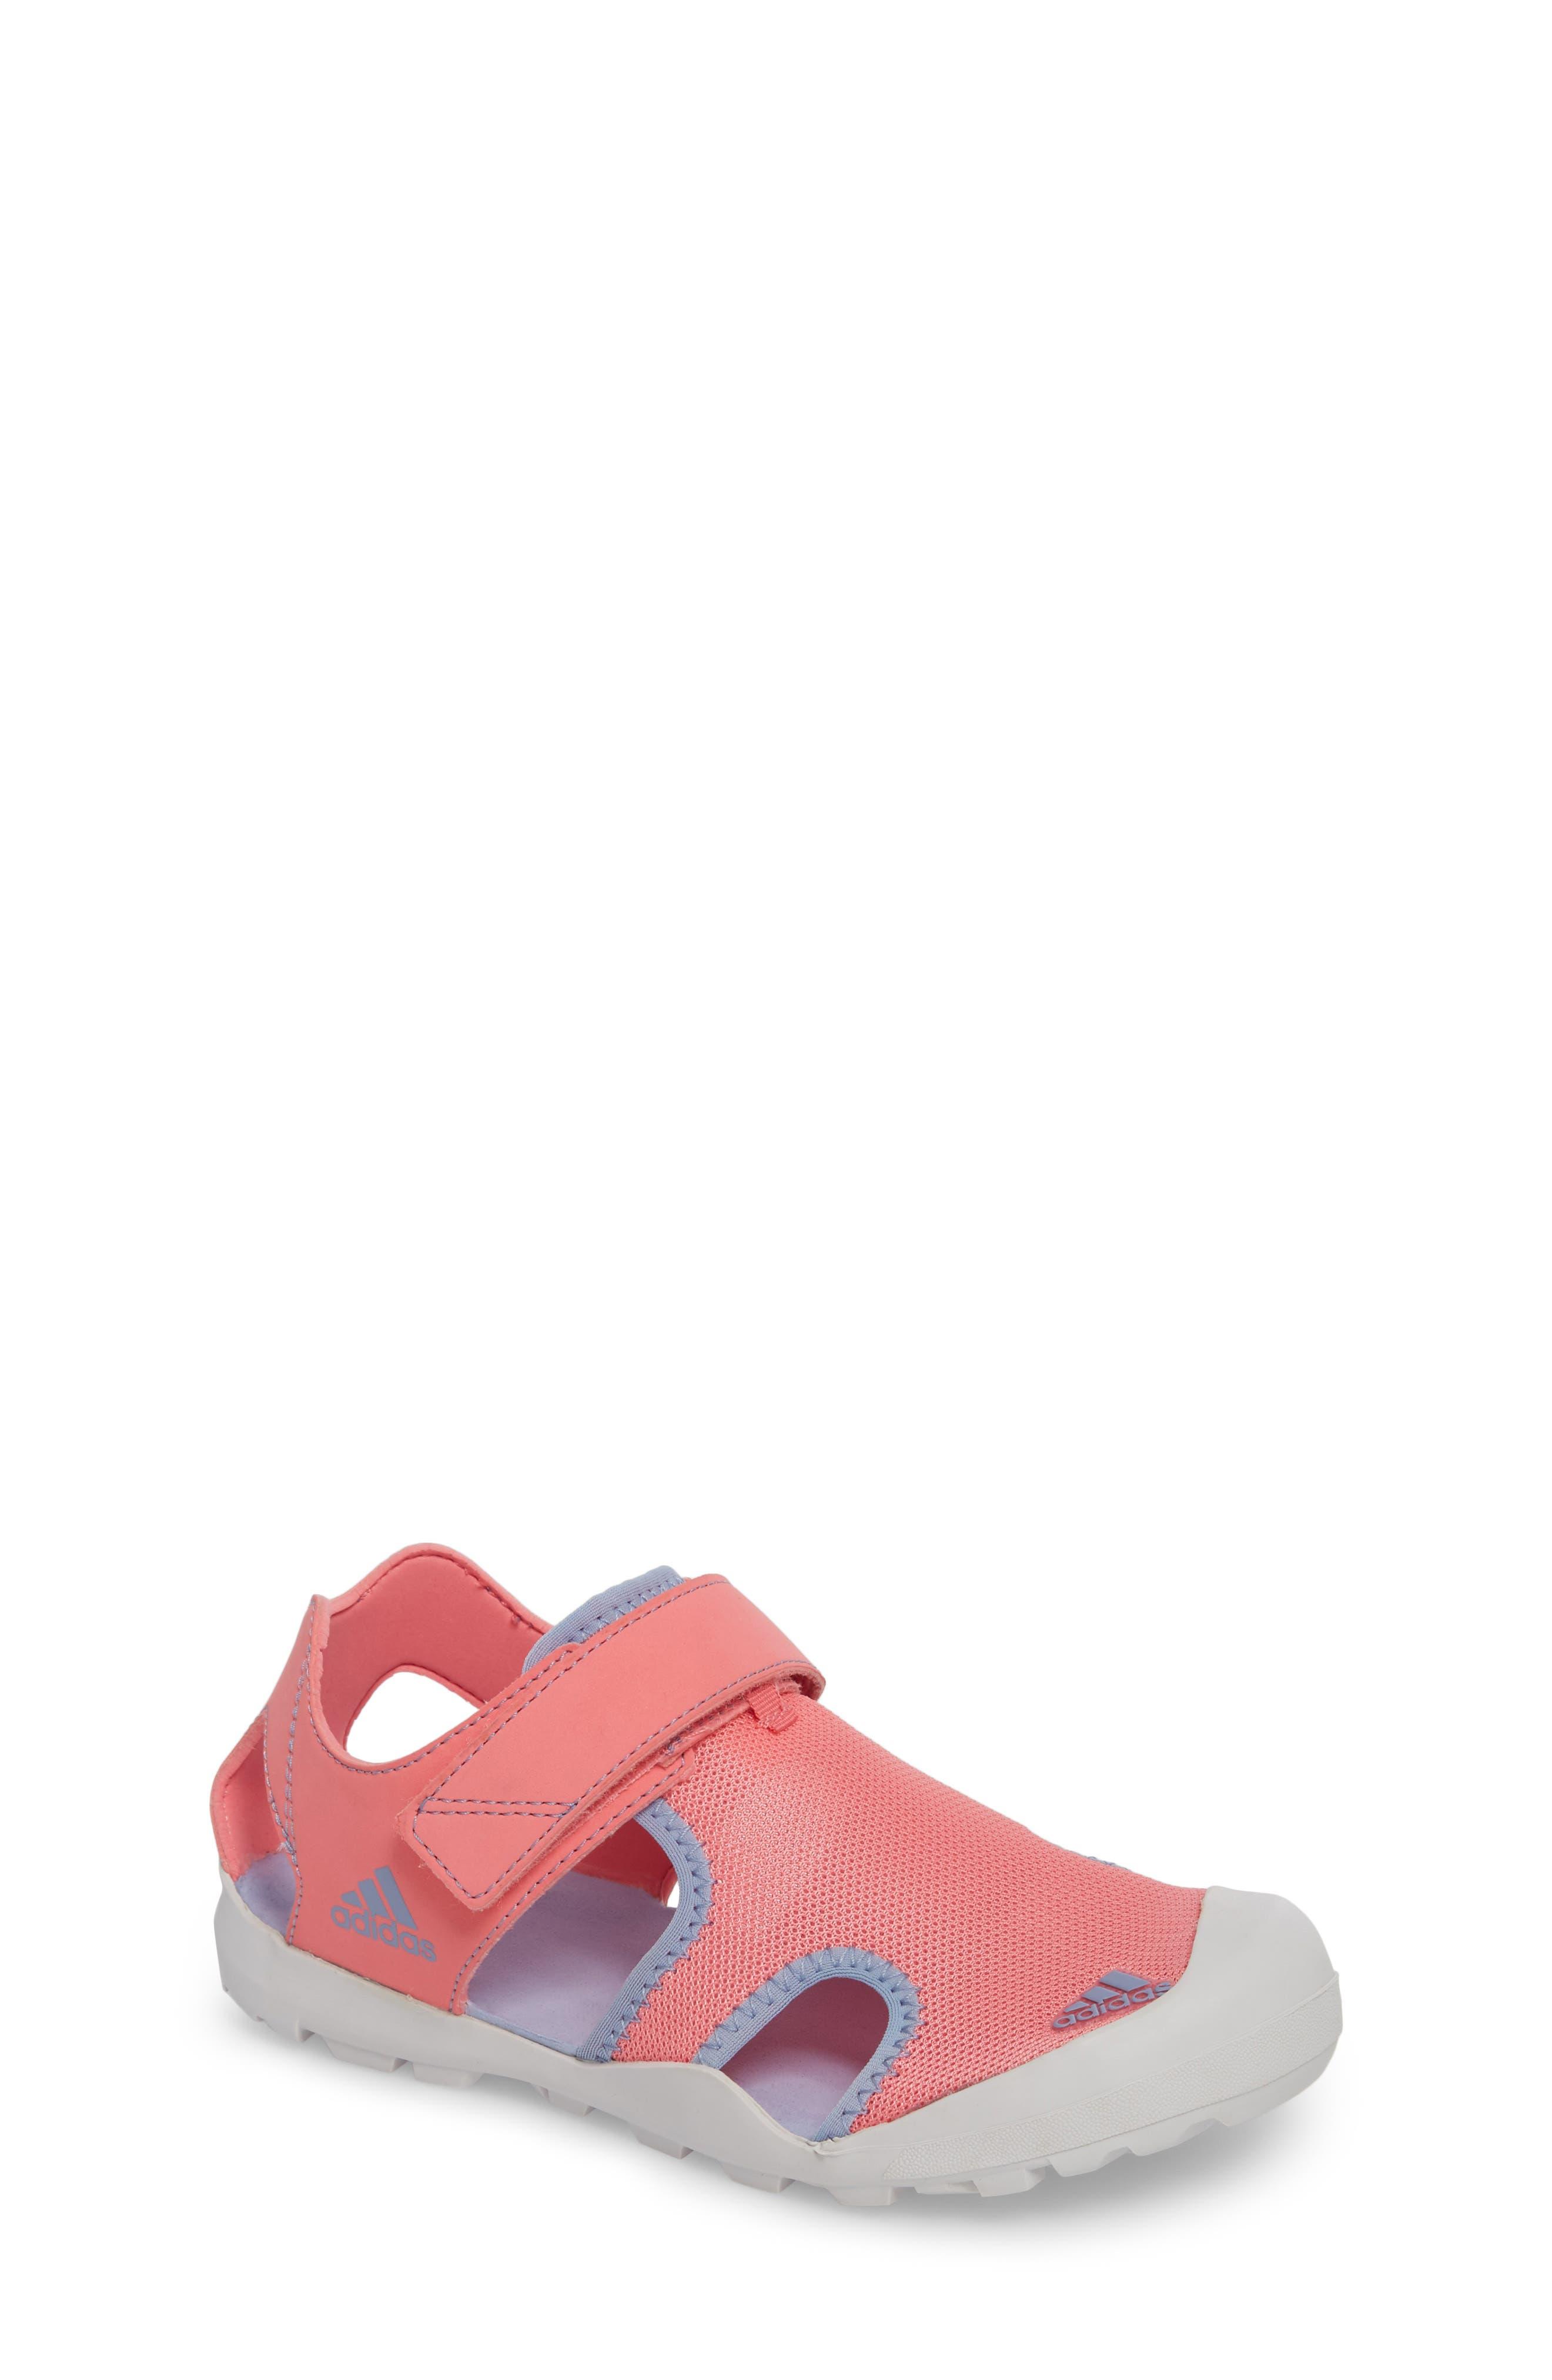 'Captain Toey' Sandal,                         Main,                         color, Chalk Pink/ Chalk Blue/ Grey